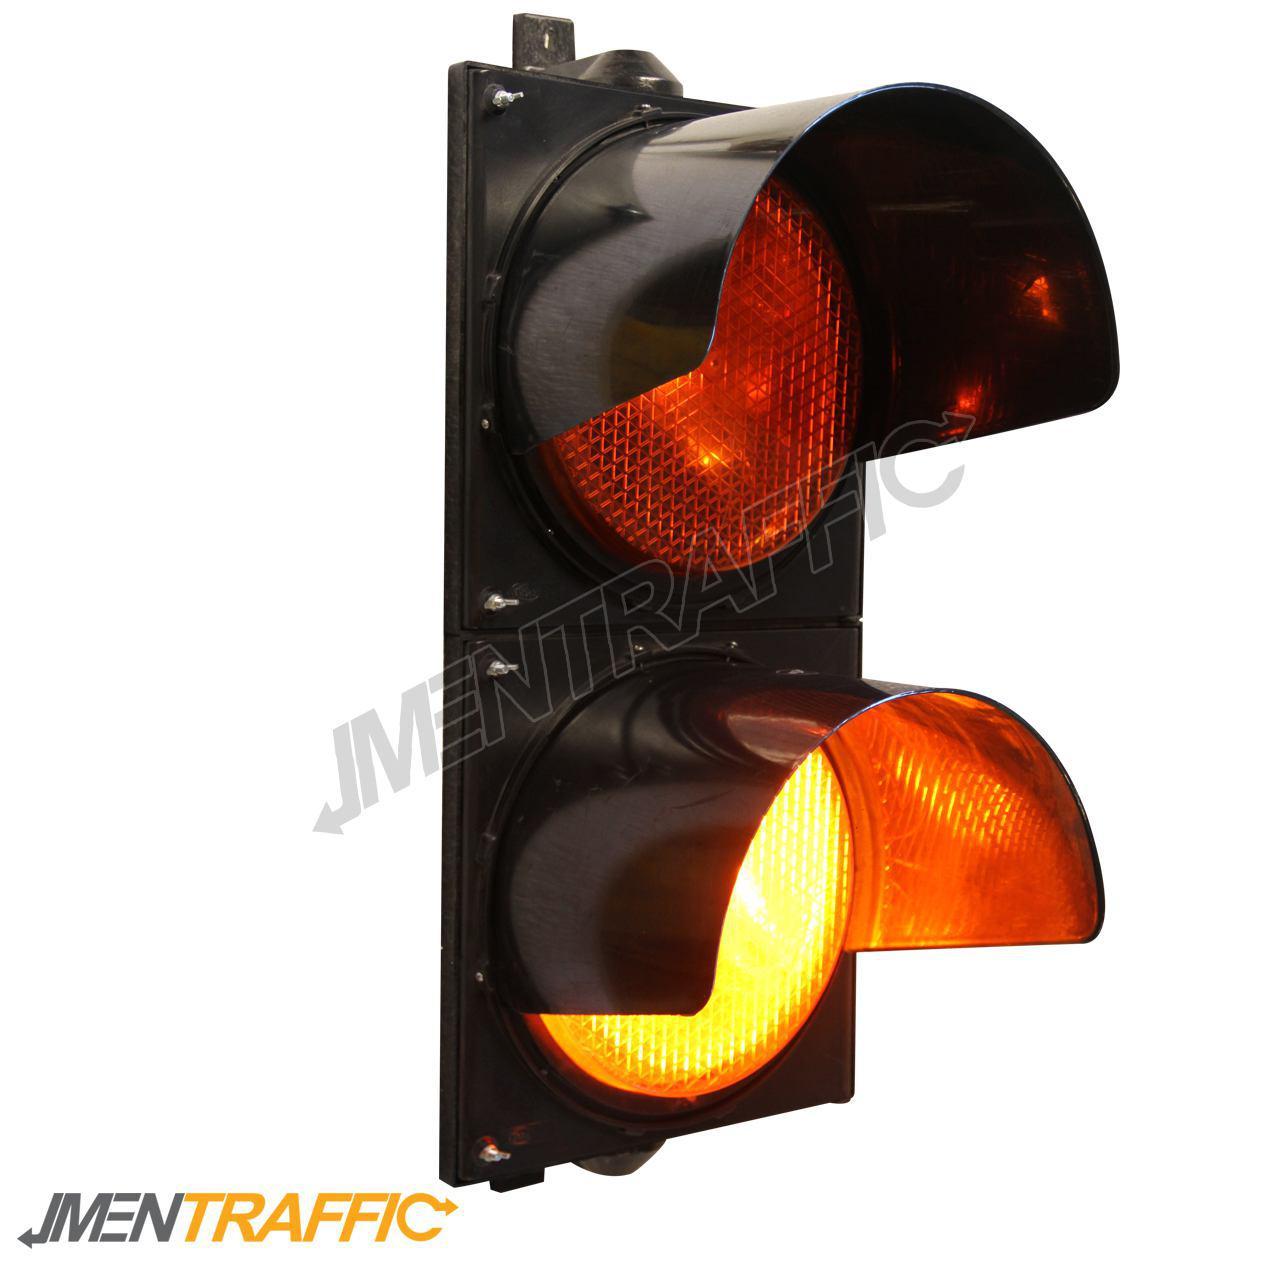 Dual-Aspect Traffic Signal Light Bulb